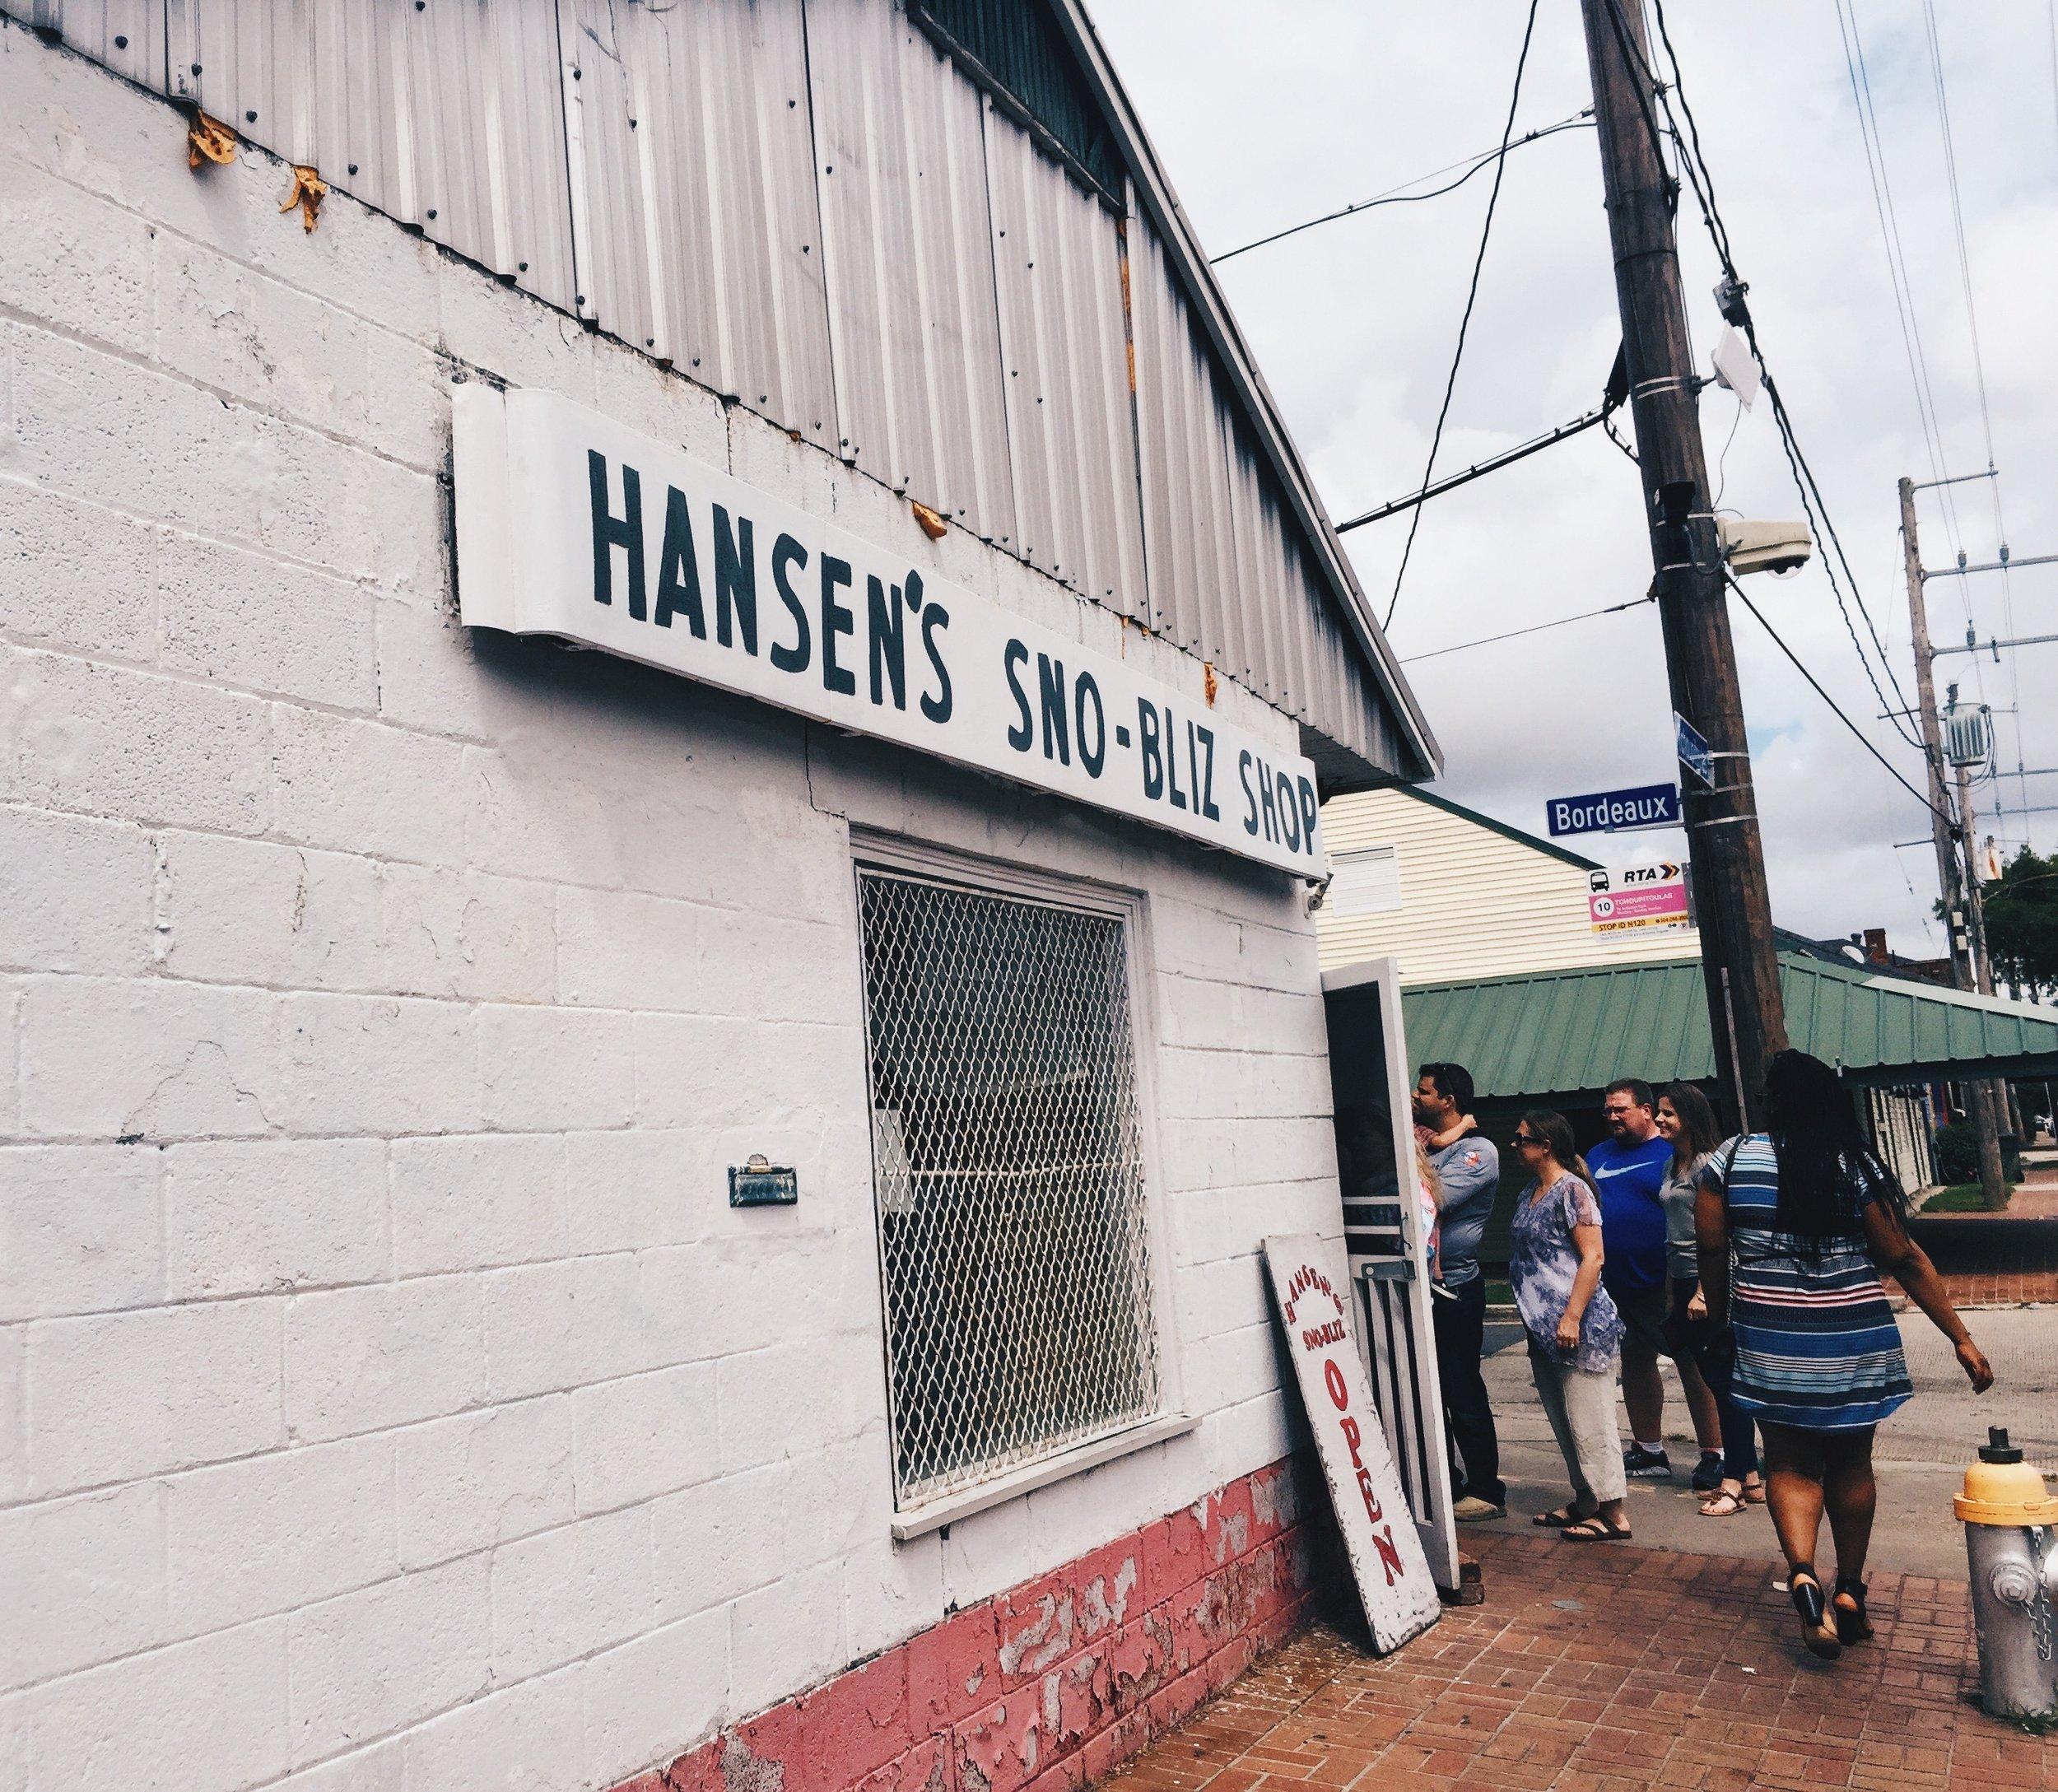 Hansen's Sno-Bliz Shop